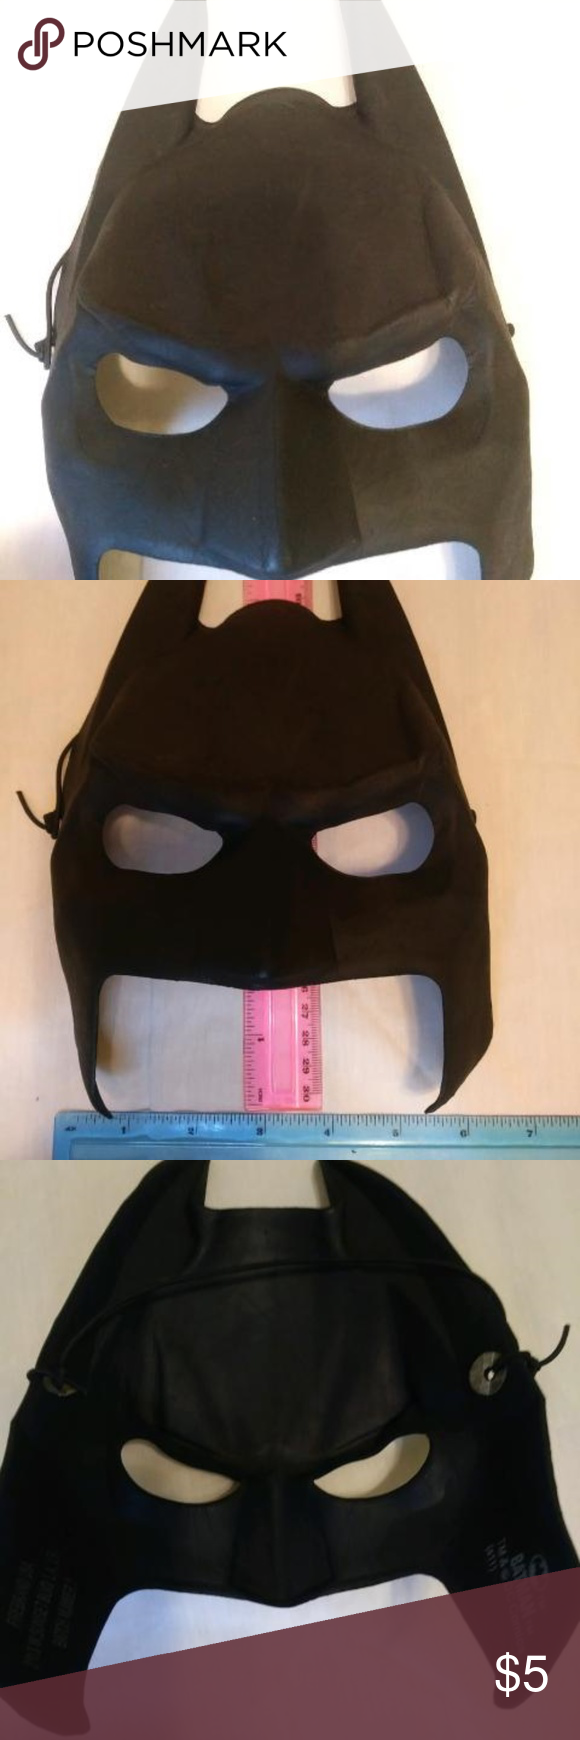 Batman Face Mask Costume Black Clothes Design Black Batman Black